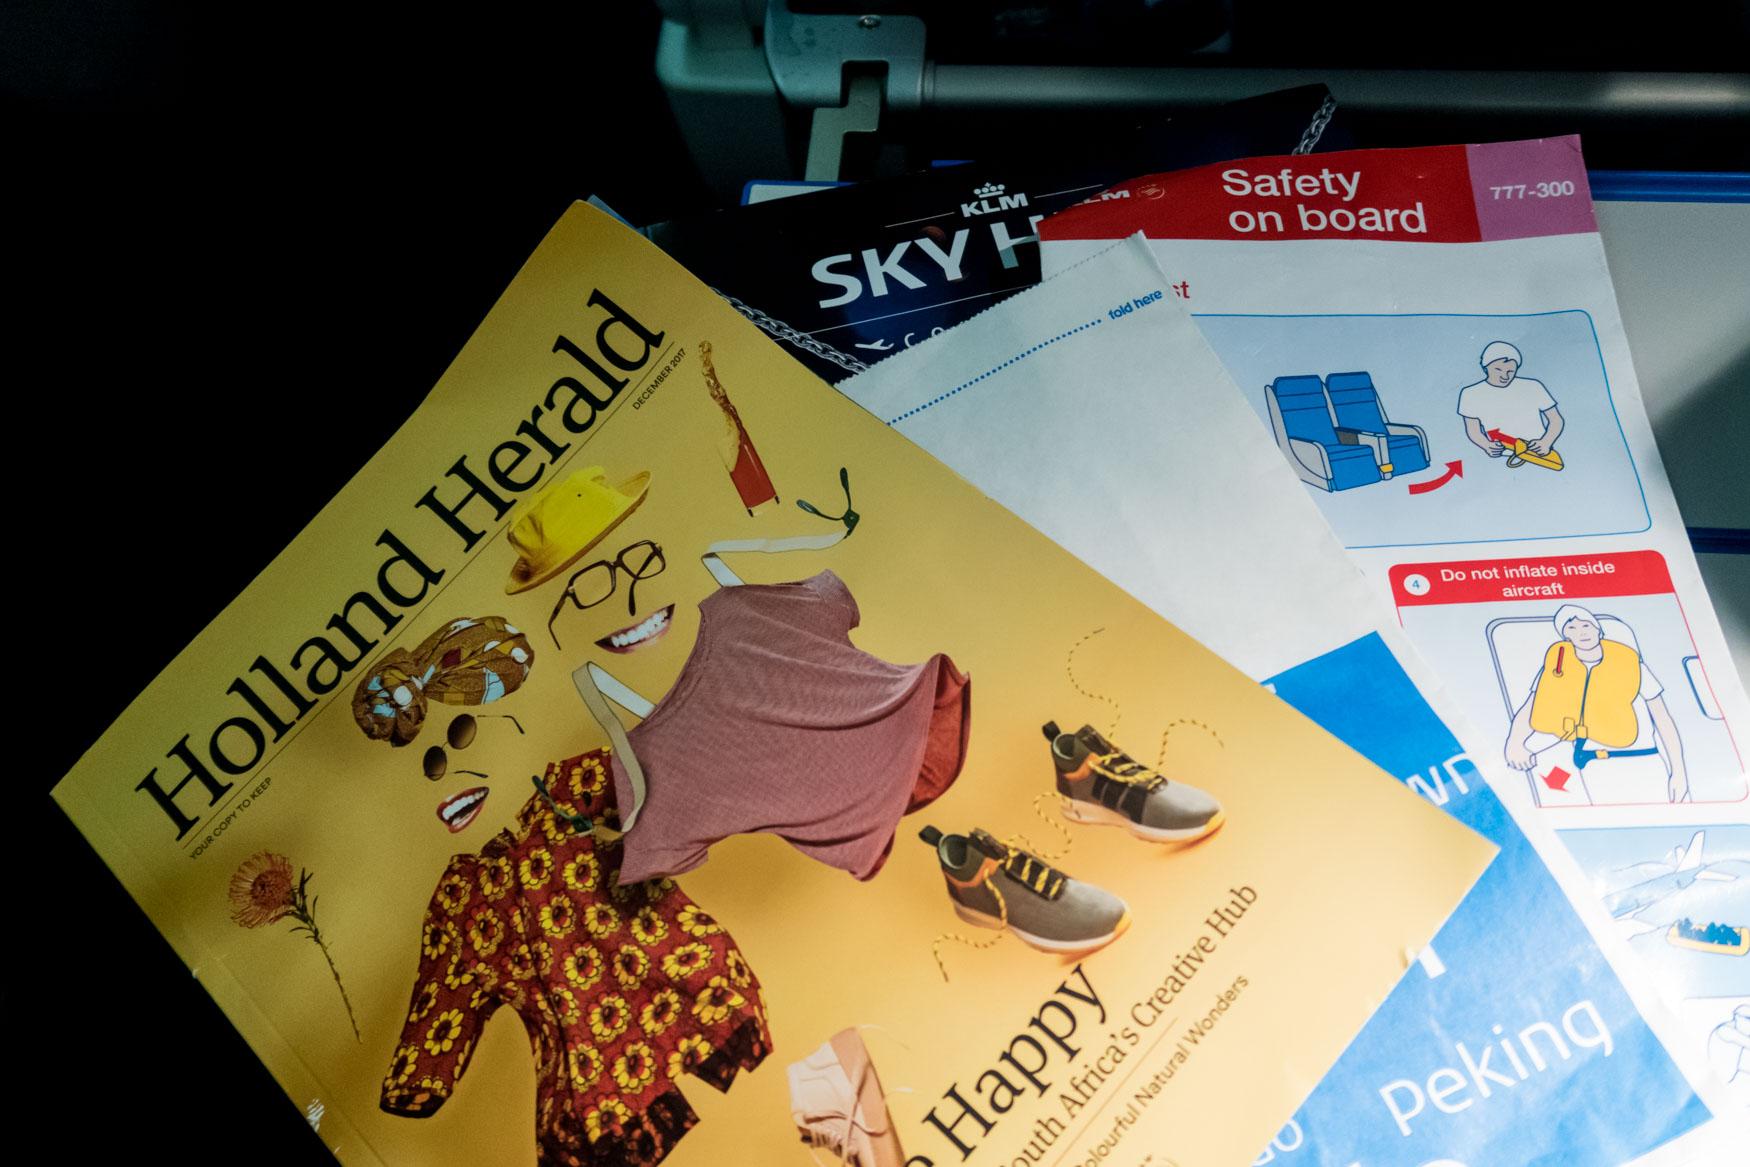 Holland Herald KLM In-Flight Magazine